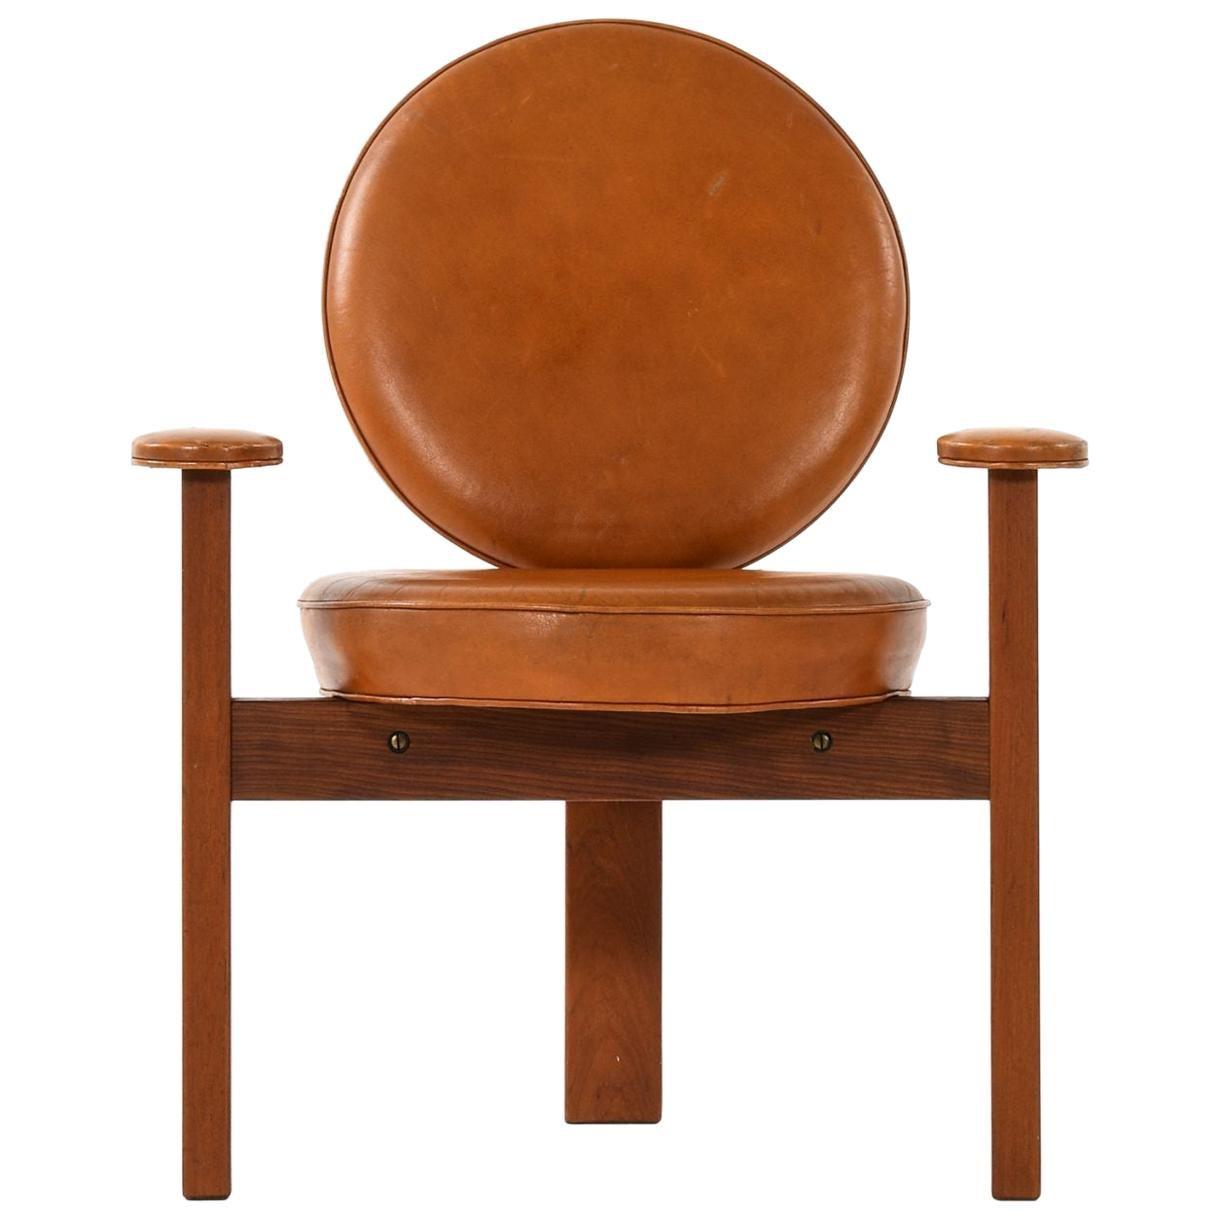 Bent Møller Jepsen Easy Chair Produced by Sitamo Møbler in Denmark